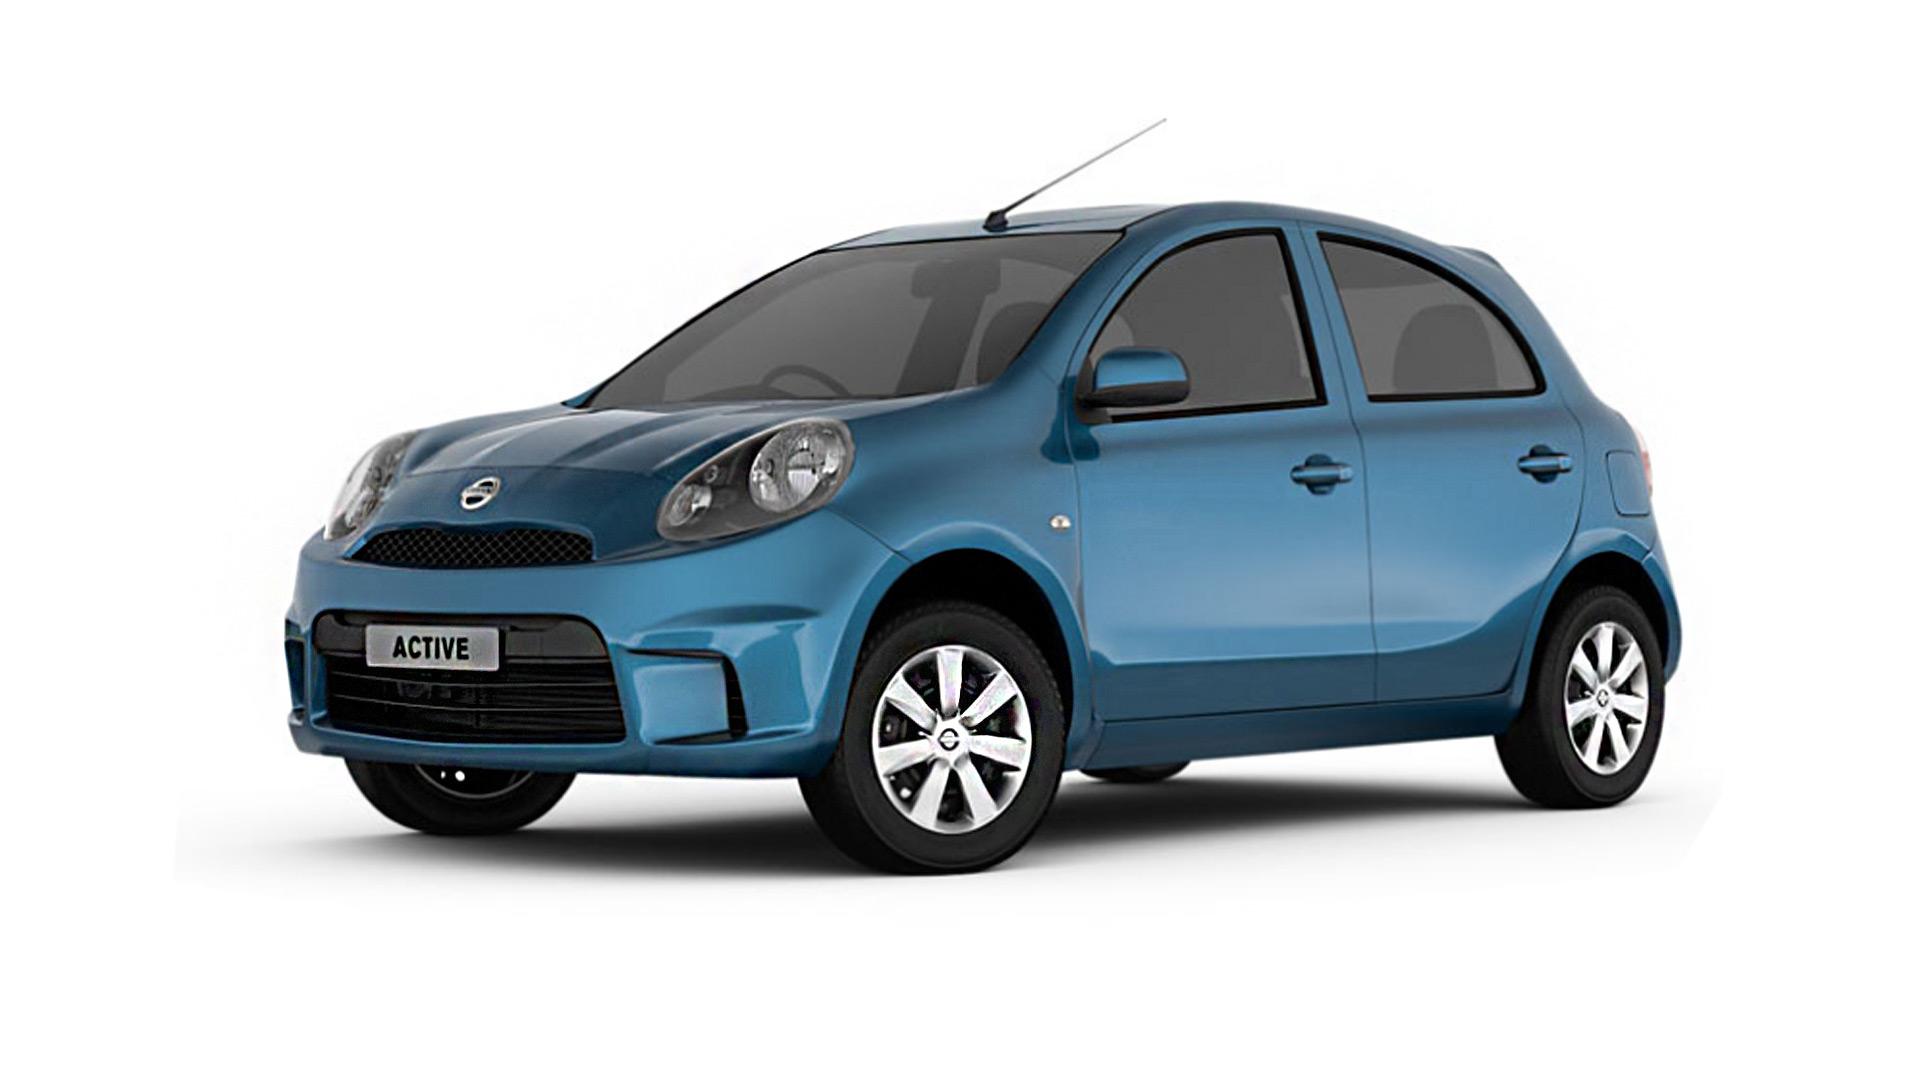 Nissan Micra Active 2013 - Price, Mileage, Reviews ...